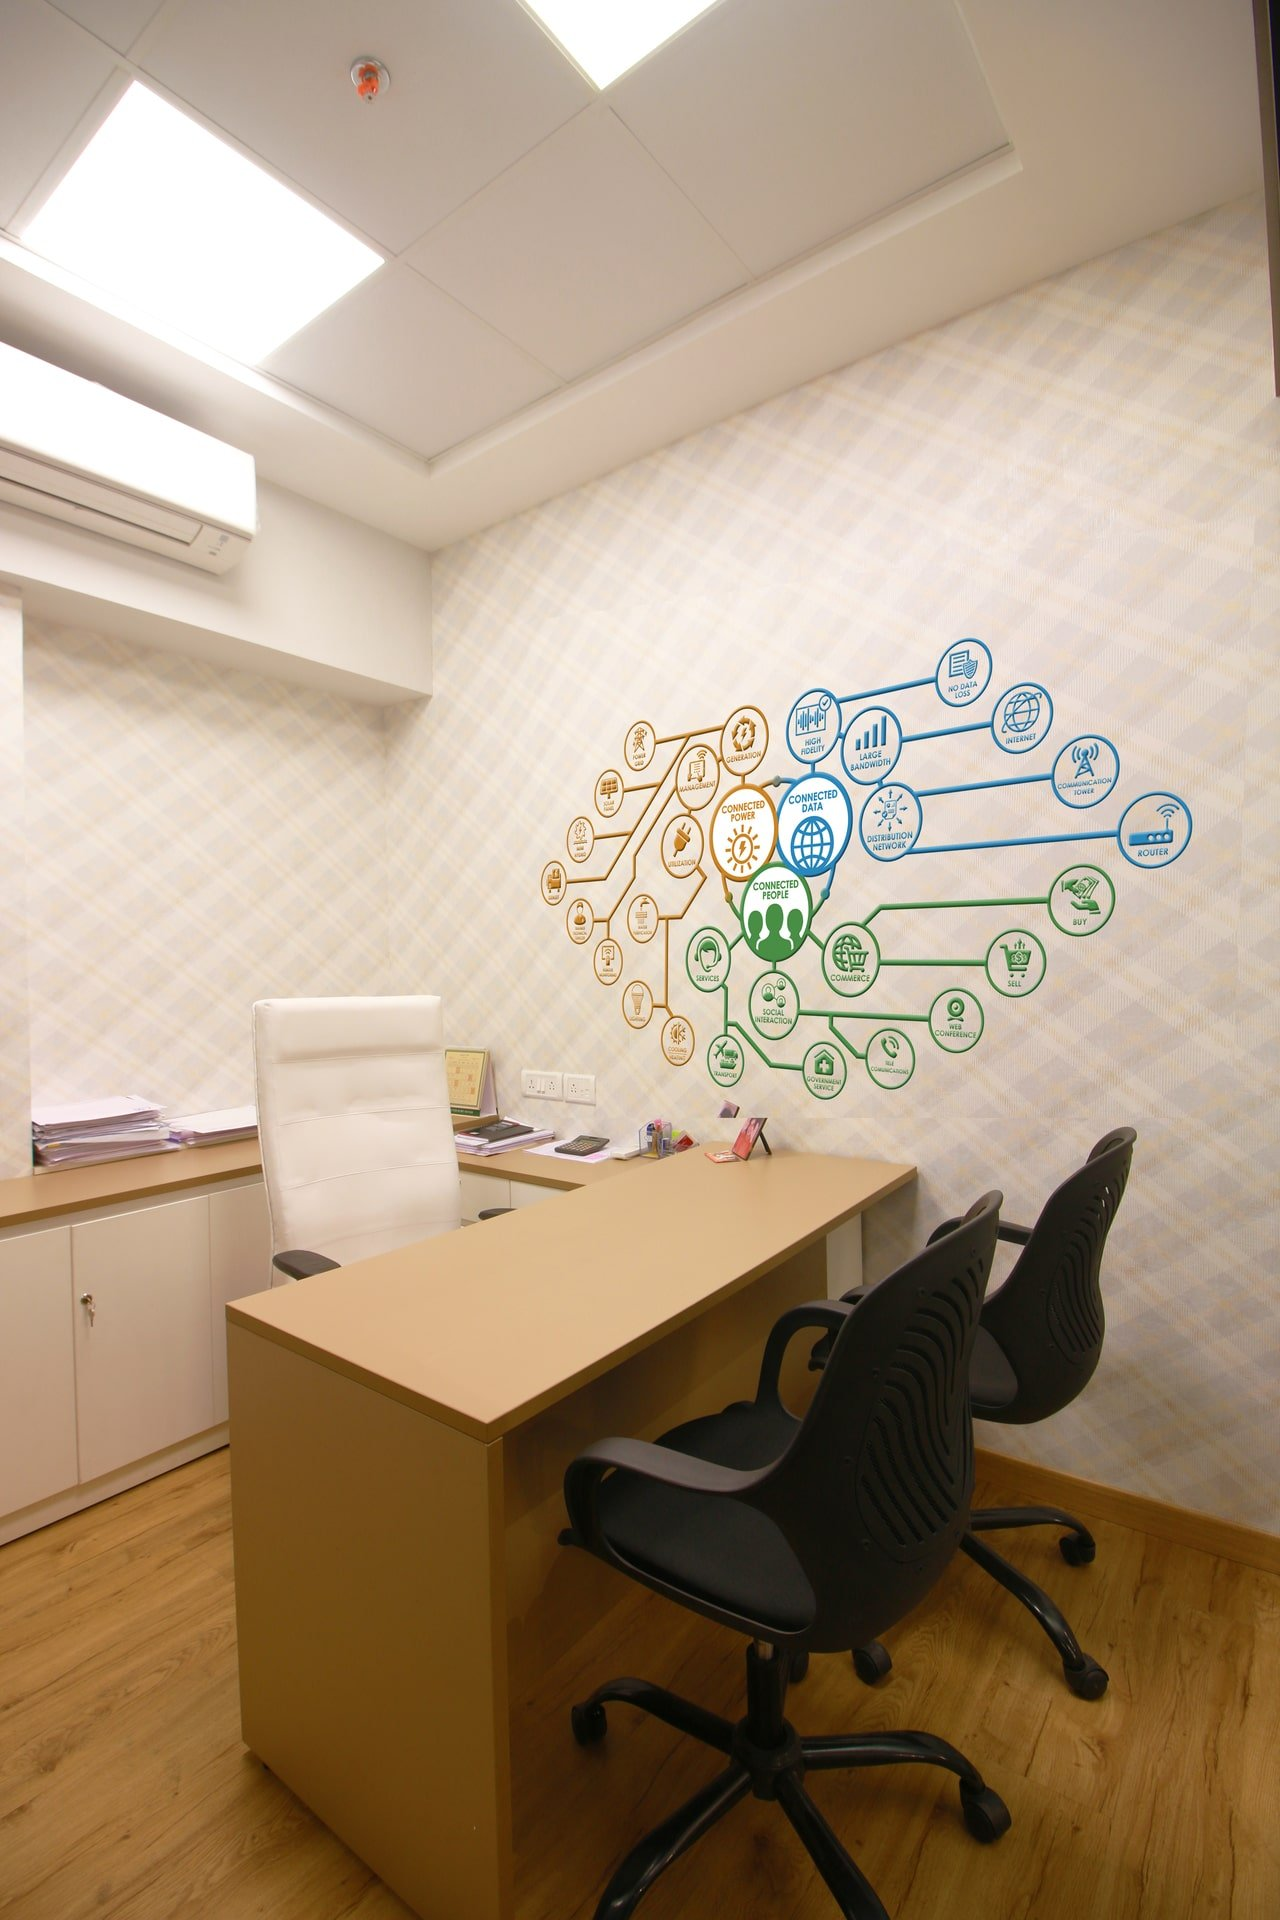 lodha-supremus-powai-office-interior-design-mumbai-2